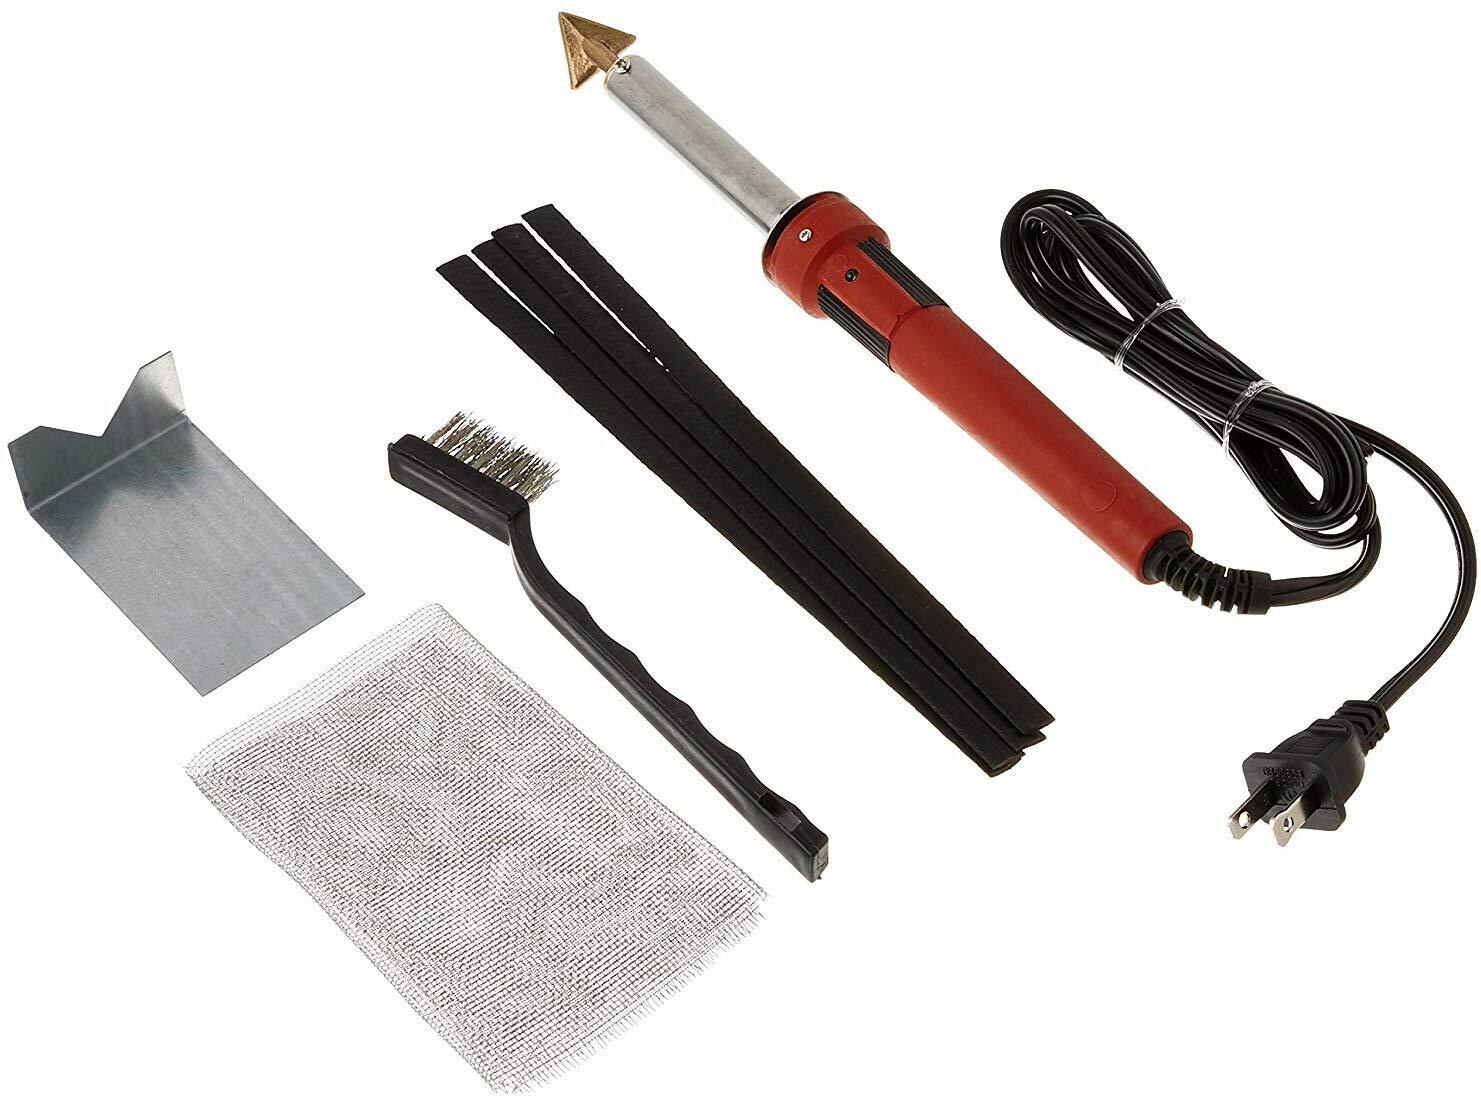 Vanda6549 Iron PLASTIC WELDING KIT TPO TEO PP Rod Mesh Auto Car Welder Repair Kit 80 Watt